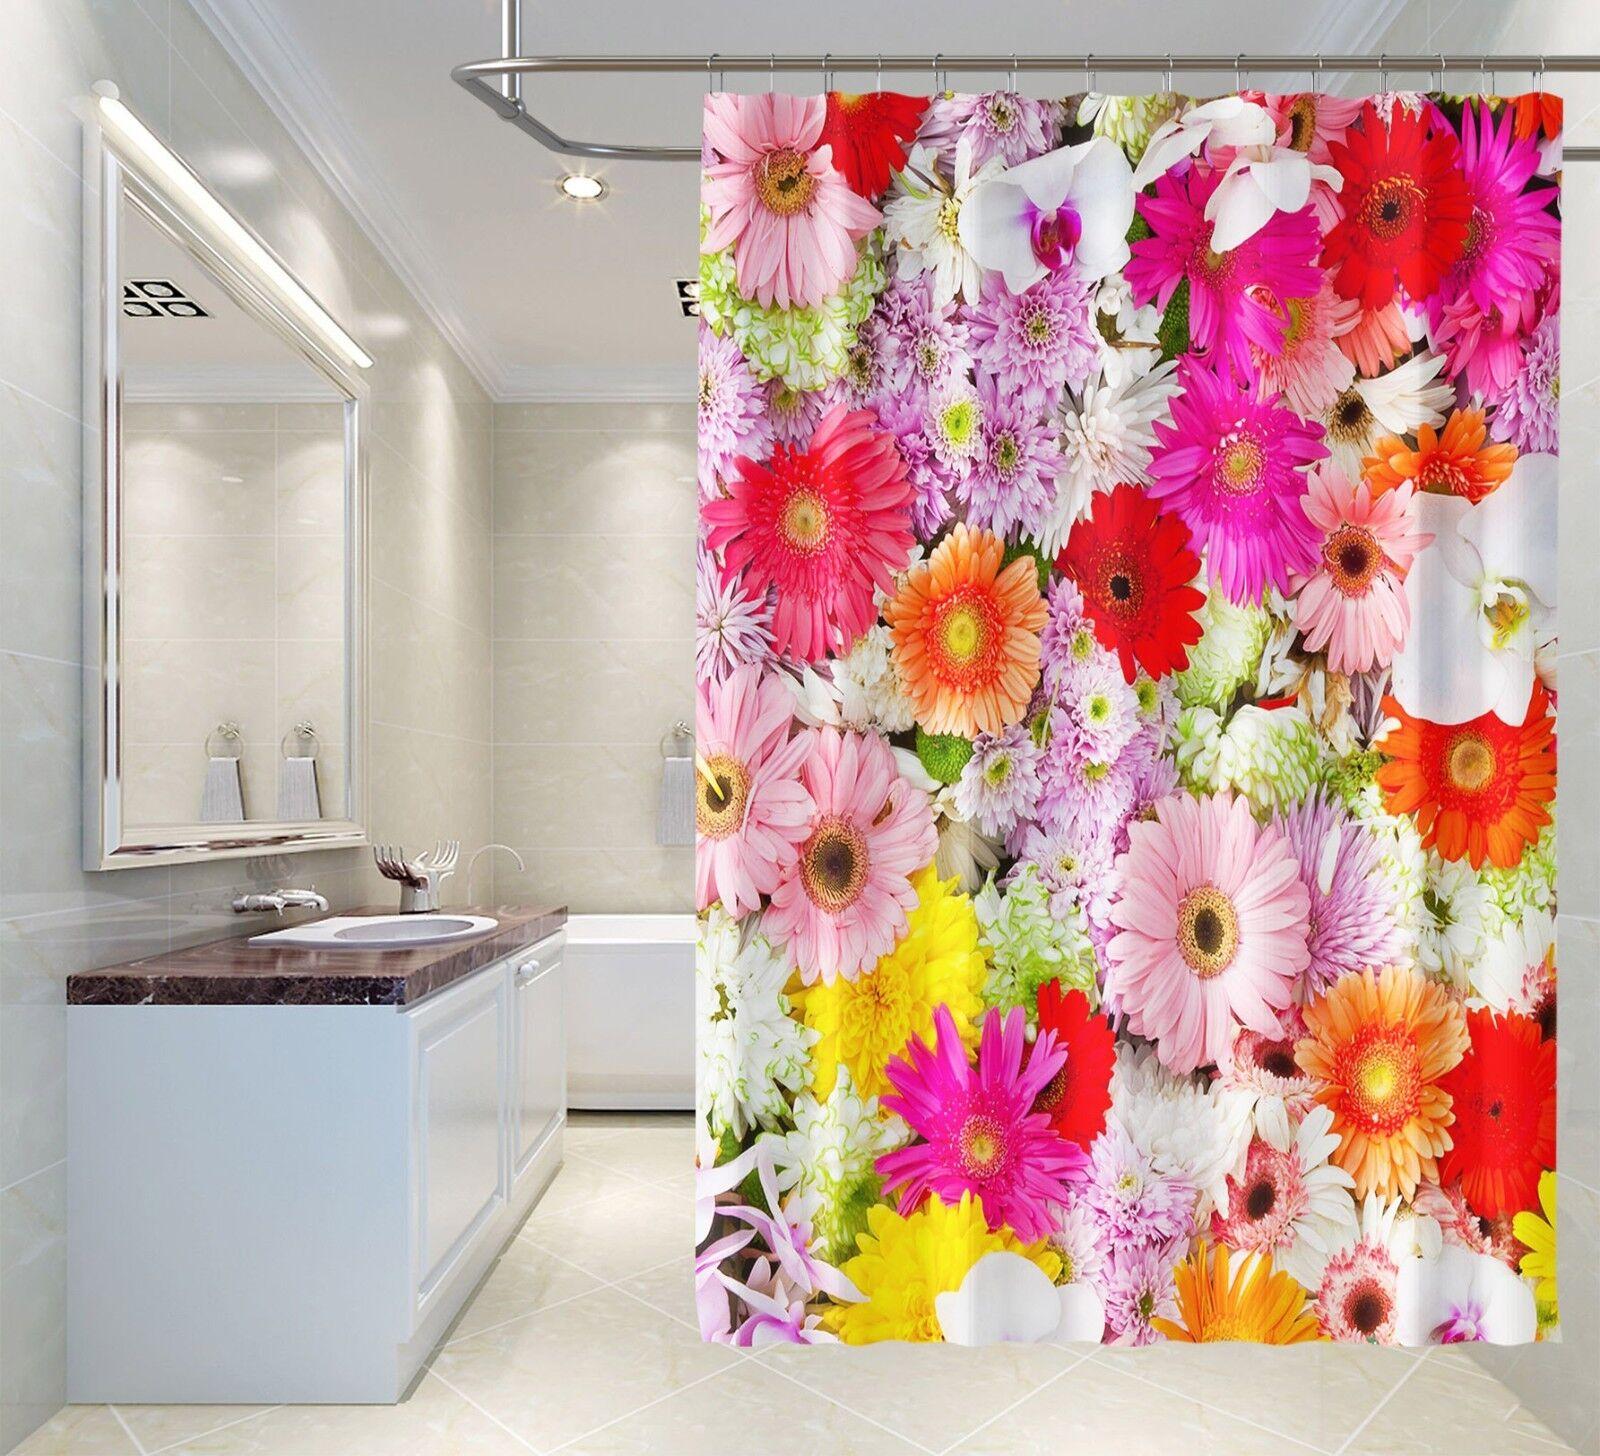 3D Farbe Blaume 352 Duschvorhang Wasserdicht Faser Bad Daheim Windows Toilette DE